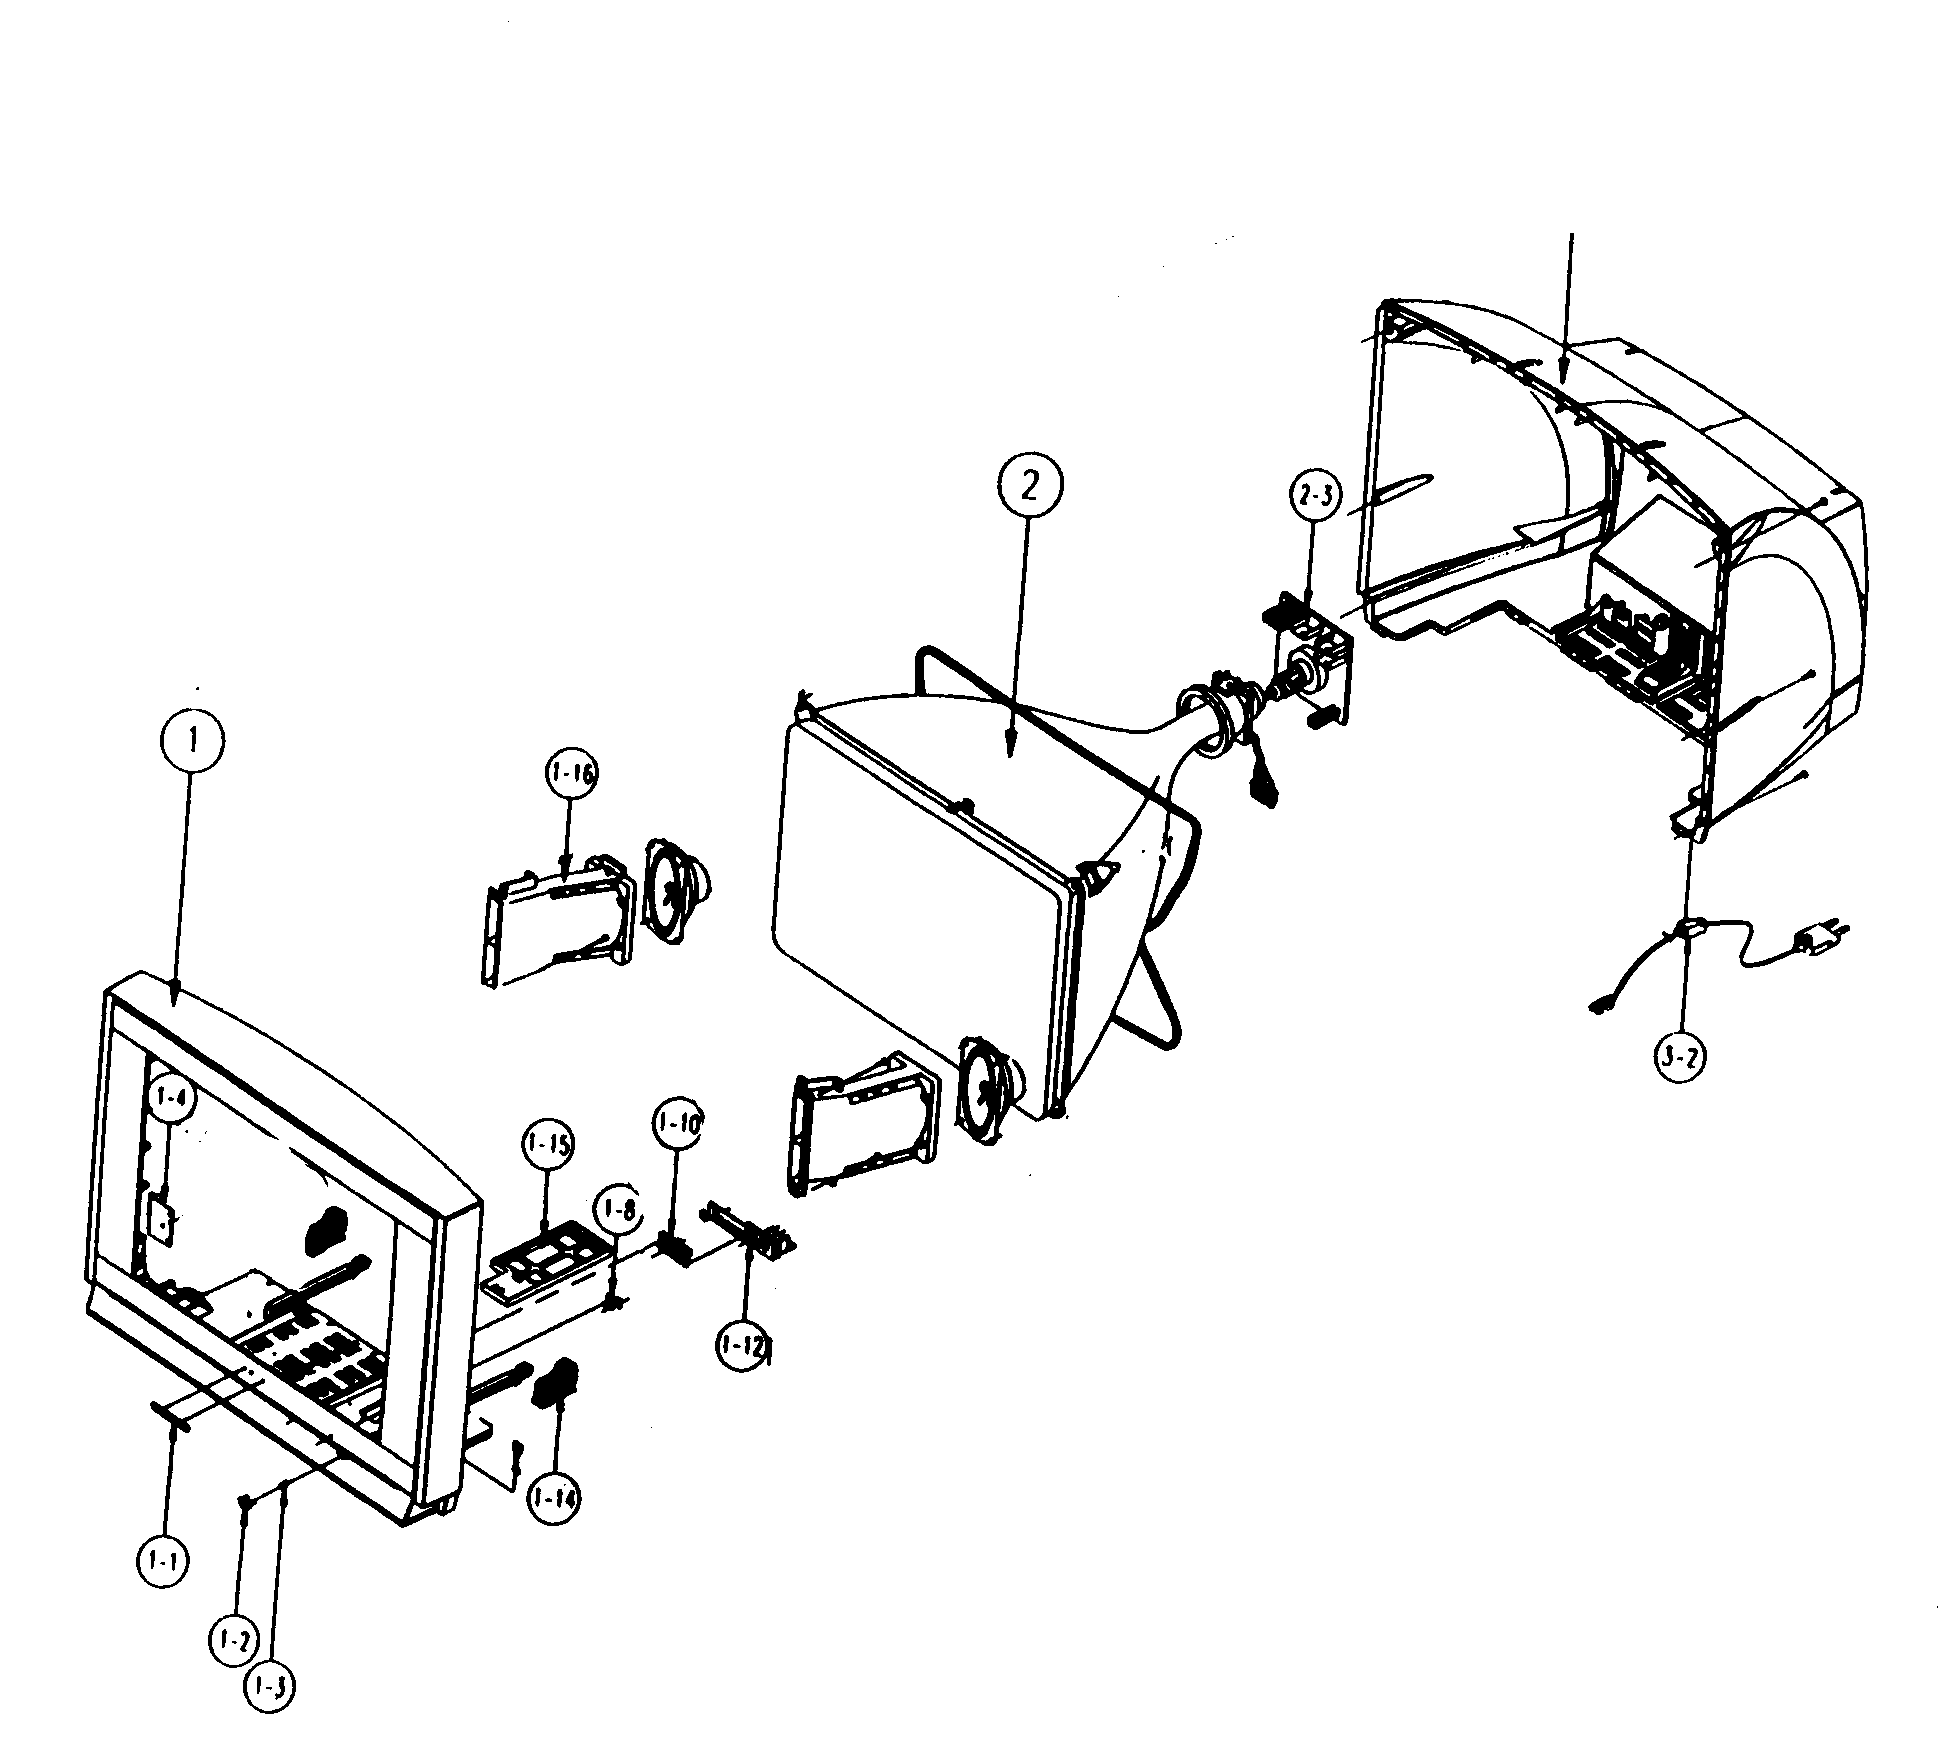 diagram parts list for model ln37b530p7fxza samsungparts television